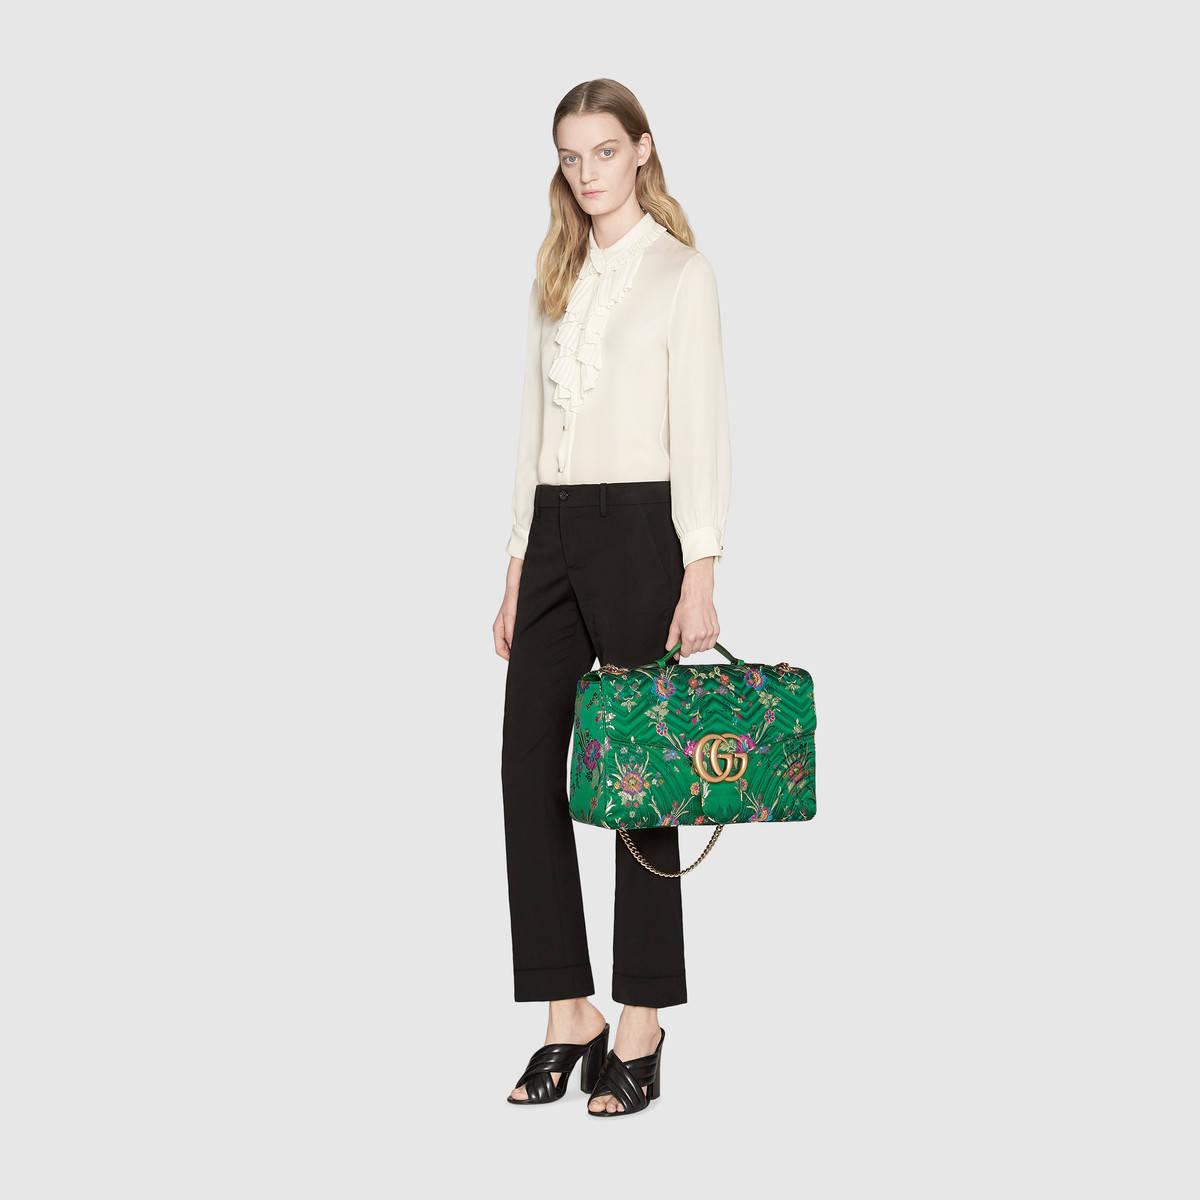 GG Marmont Maxi Floral Jacquard Shoulder Bag